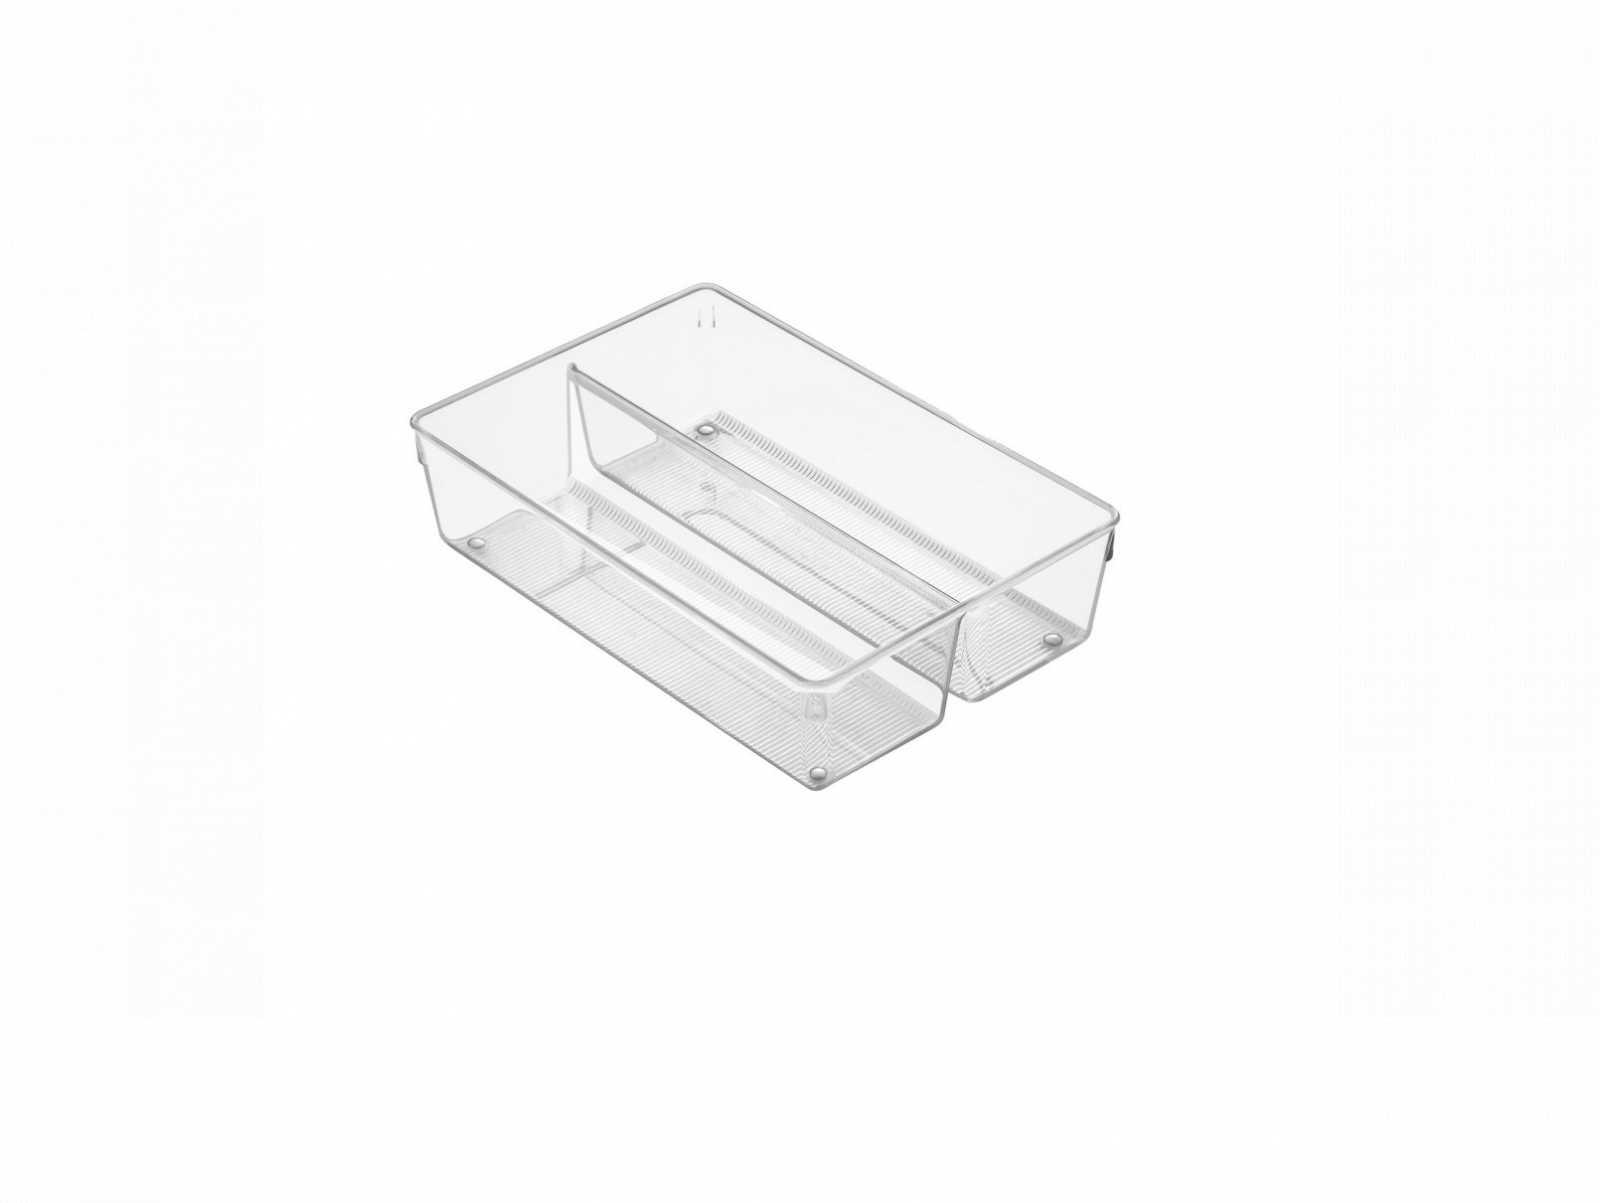 Онлайн каталог PROMENU: Органайзер для кухонных принадлежностей iDesign LINUS, 30,5х20,3х7,6 см, BPA-free пластик, прозрачный Interdesign 56130EU